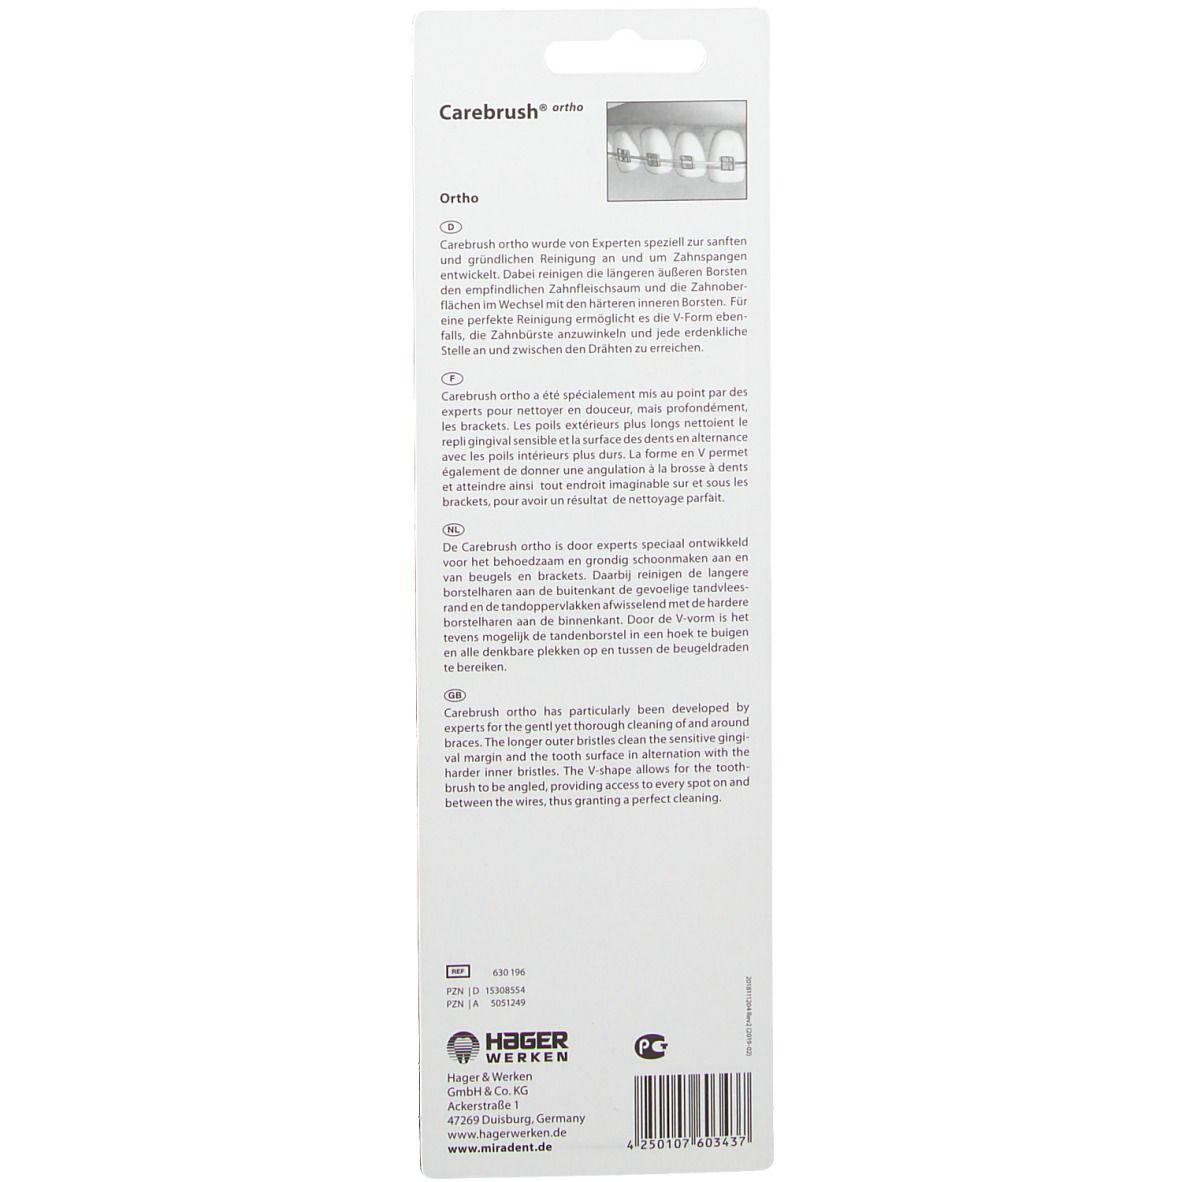 MIRADENT  Carebrush ® ortho Zahnbürste für Spangenträger